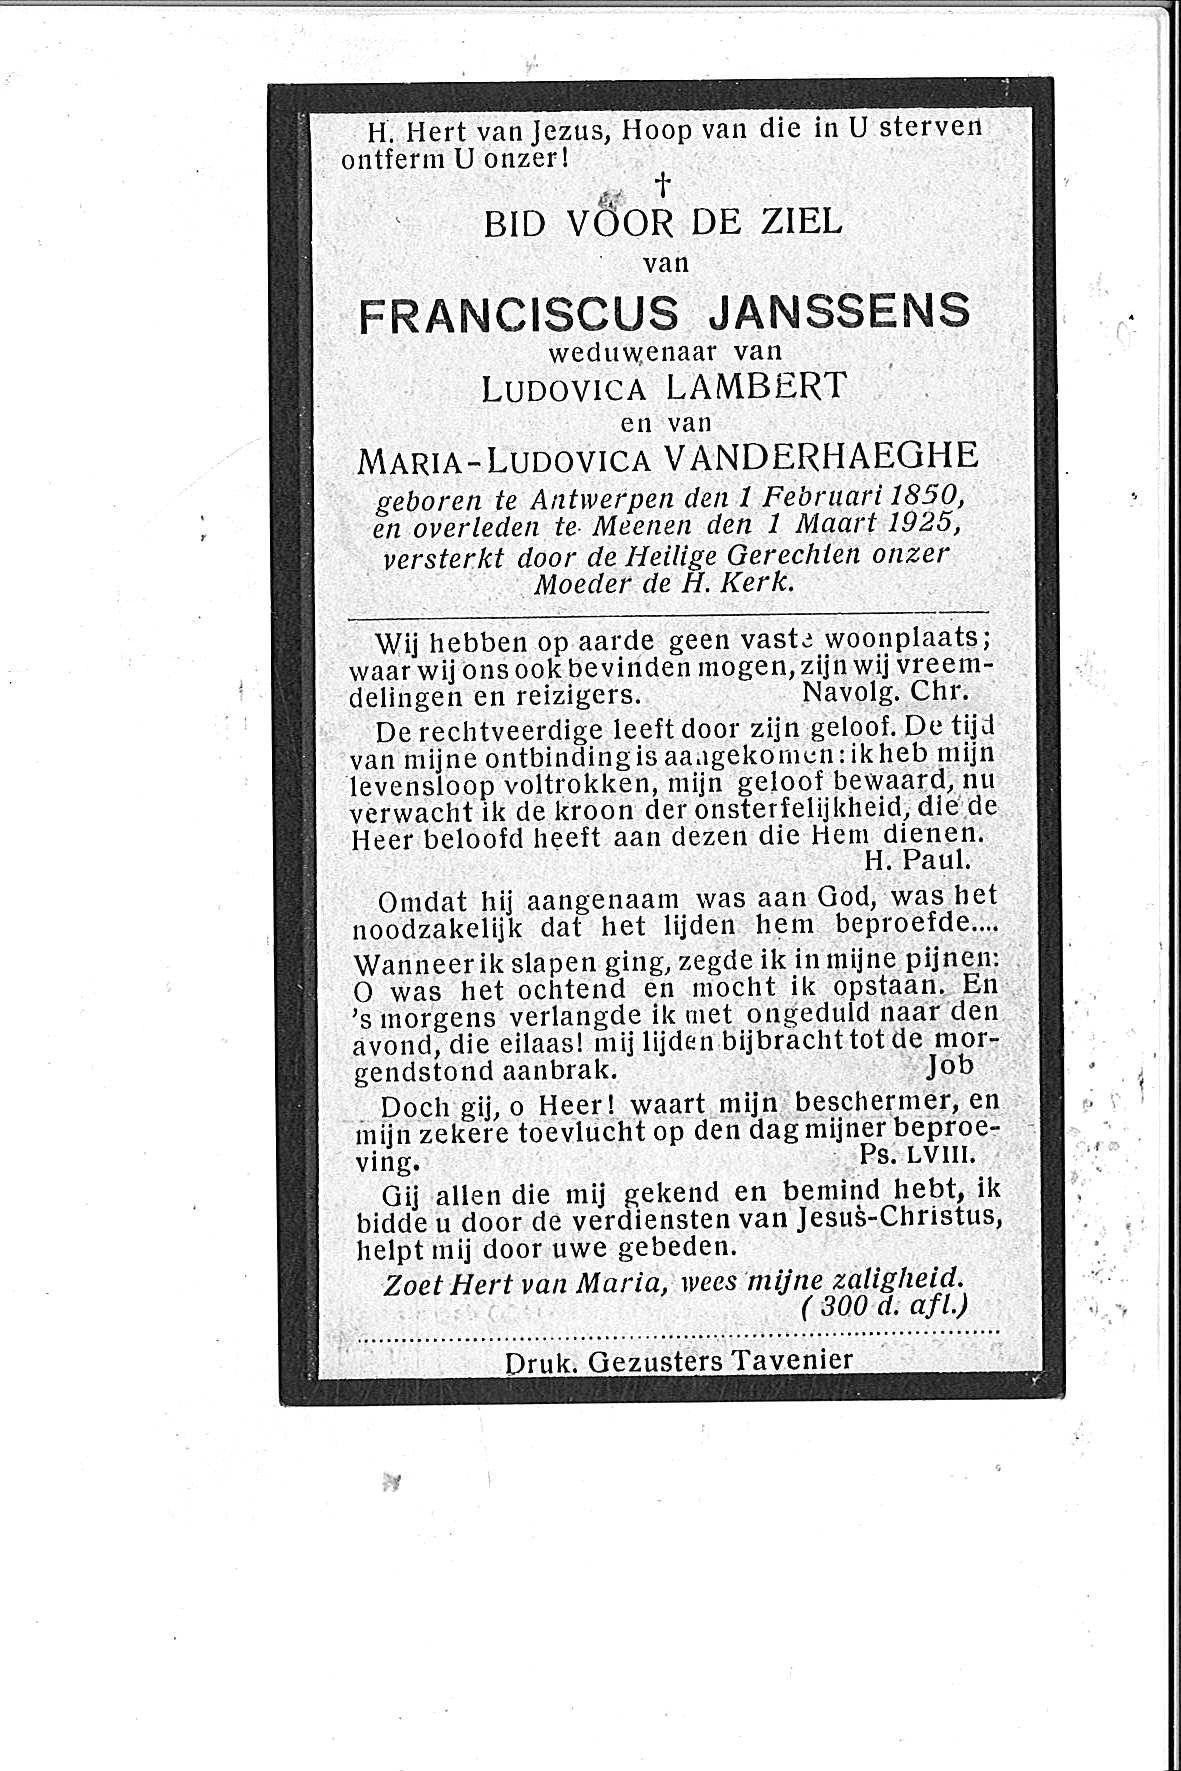 Franciscus(1925)20150330095309_00020.jpg